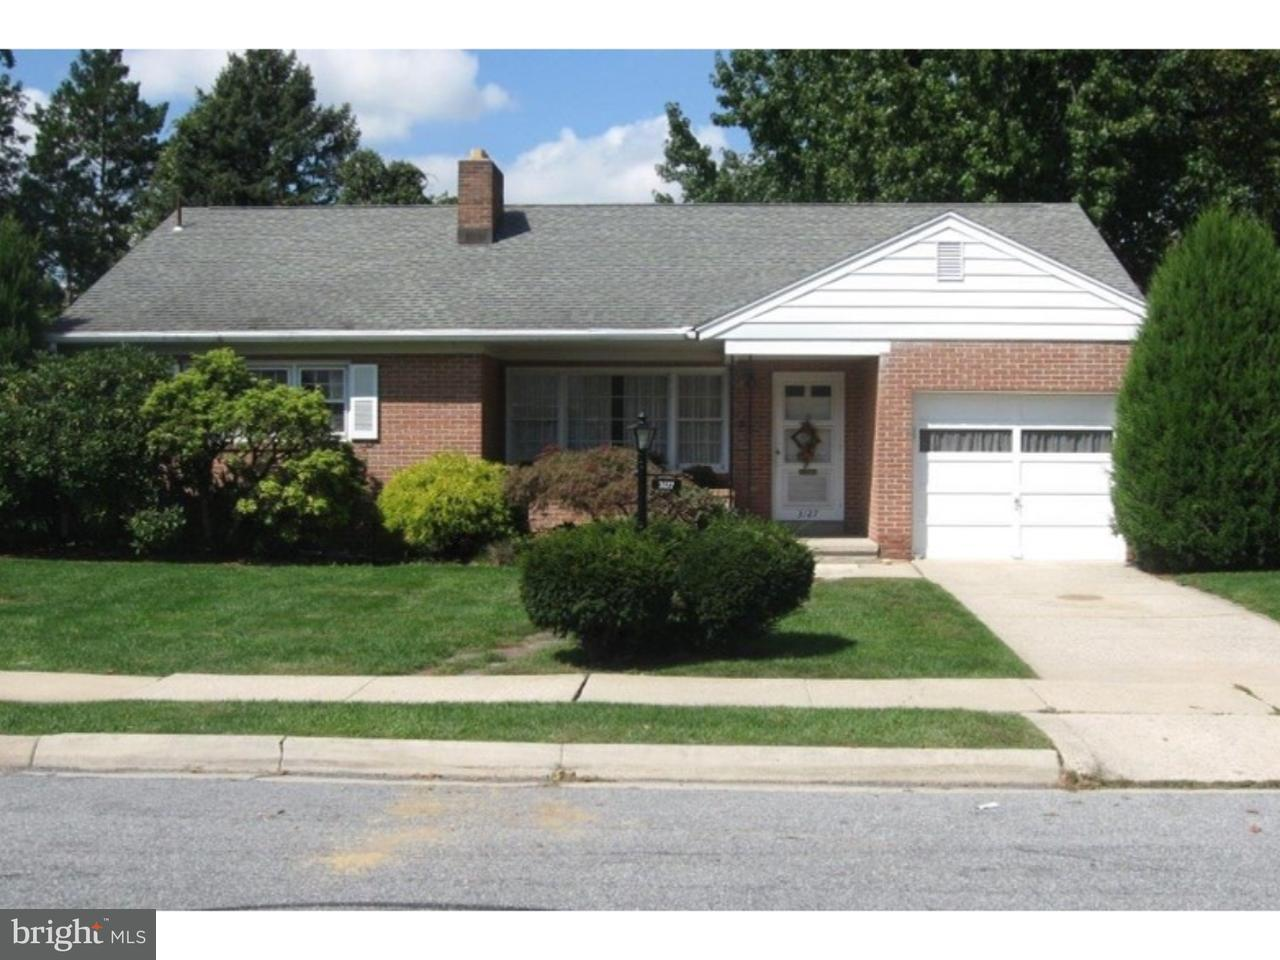 Casa unifamiliar adosada (Townhouse) por un Alquiler en 3127 OCTAGON Avenue Sinking Spring, Pennsylvania 19608 Estados Unidos